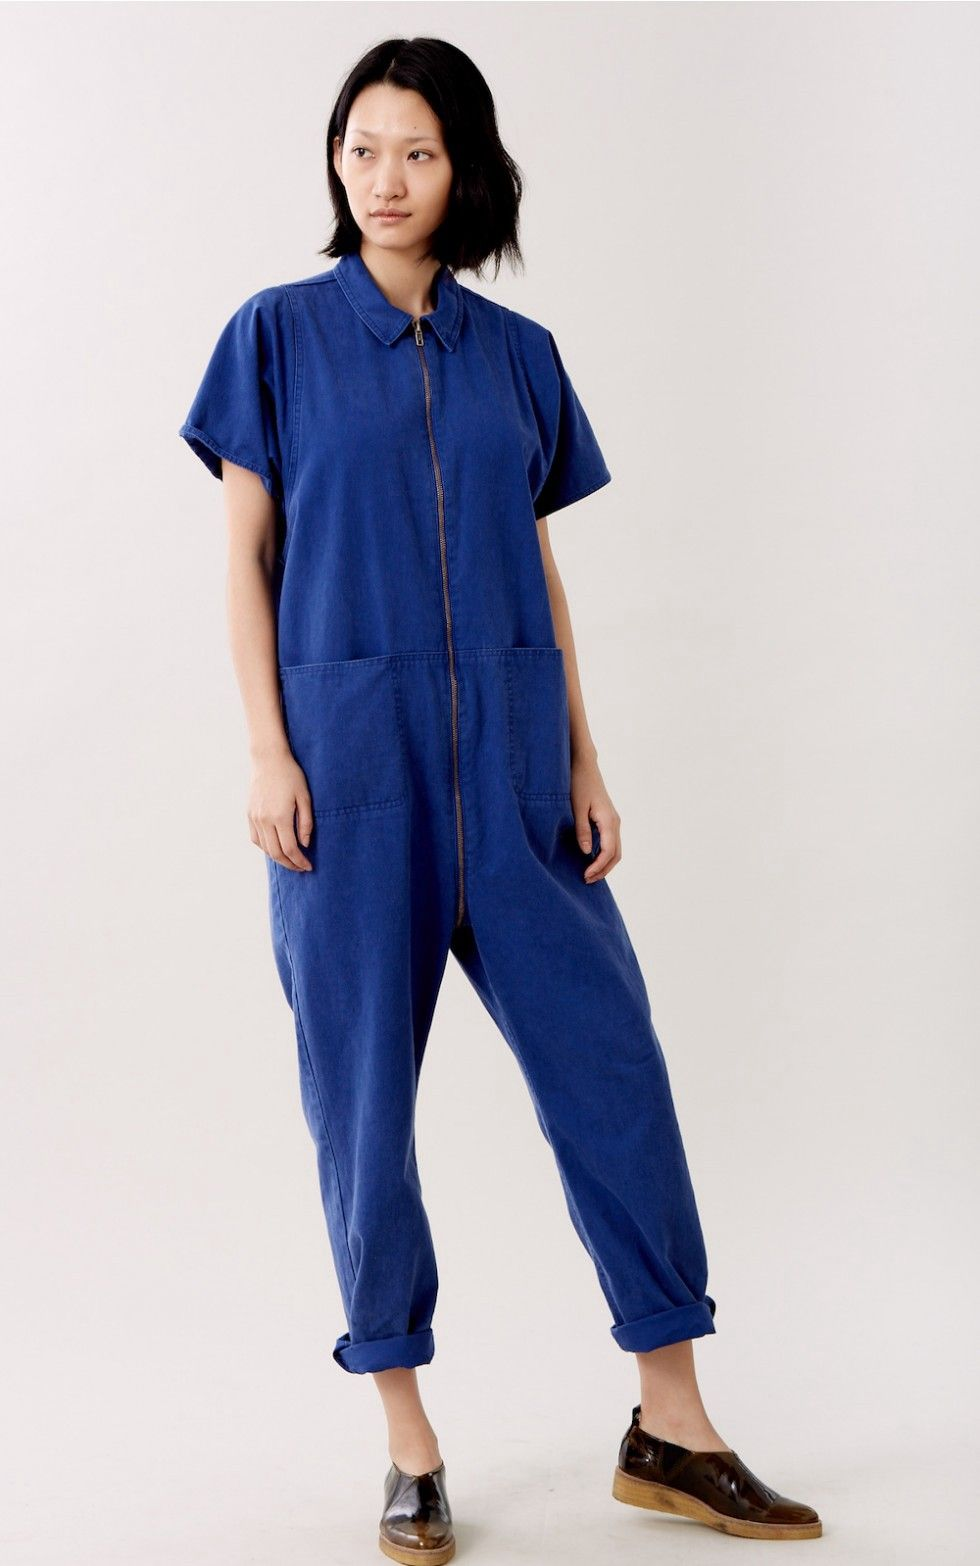 5a11cca3db07 RACHEL COMEY Barrie Jumpsuit - Choose Size.  rachelcomey  cloth  all ...